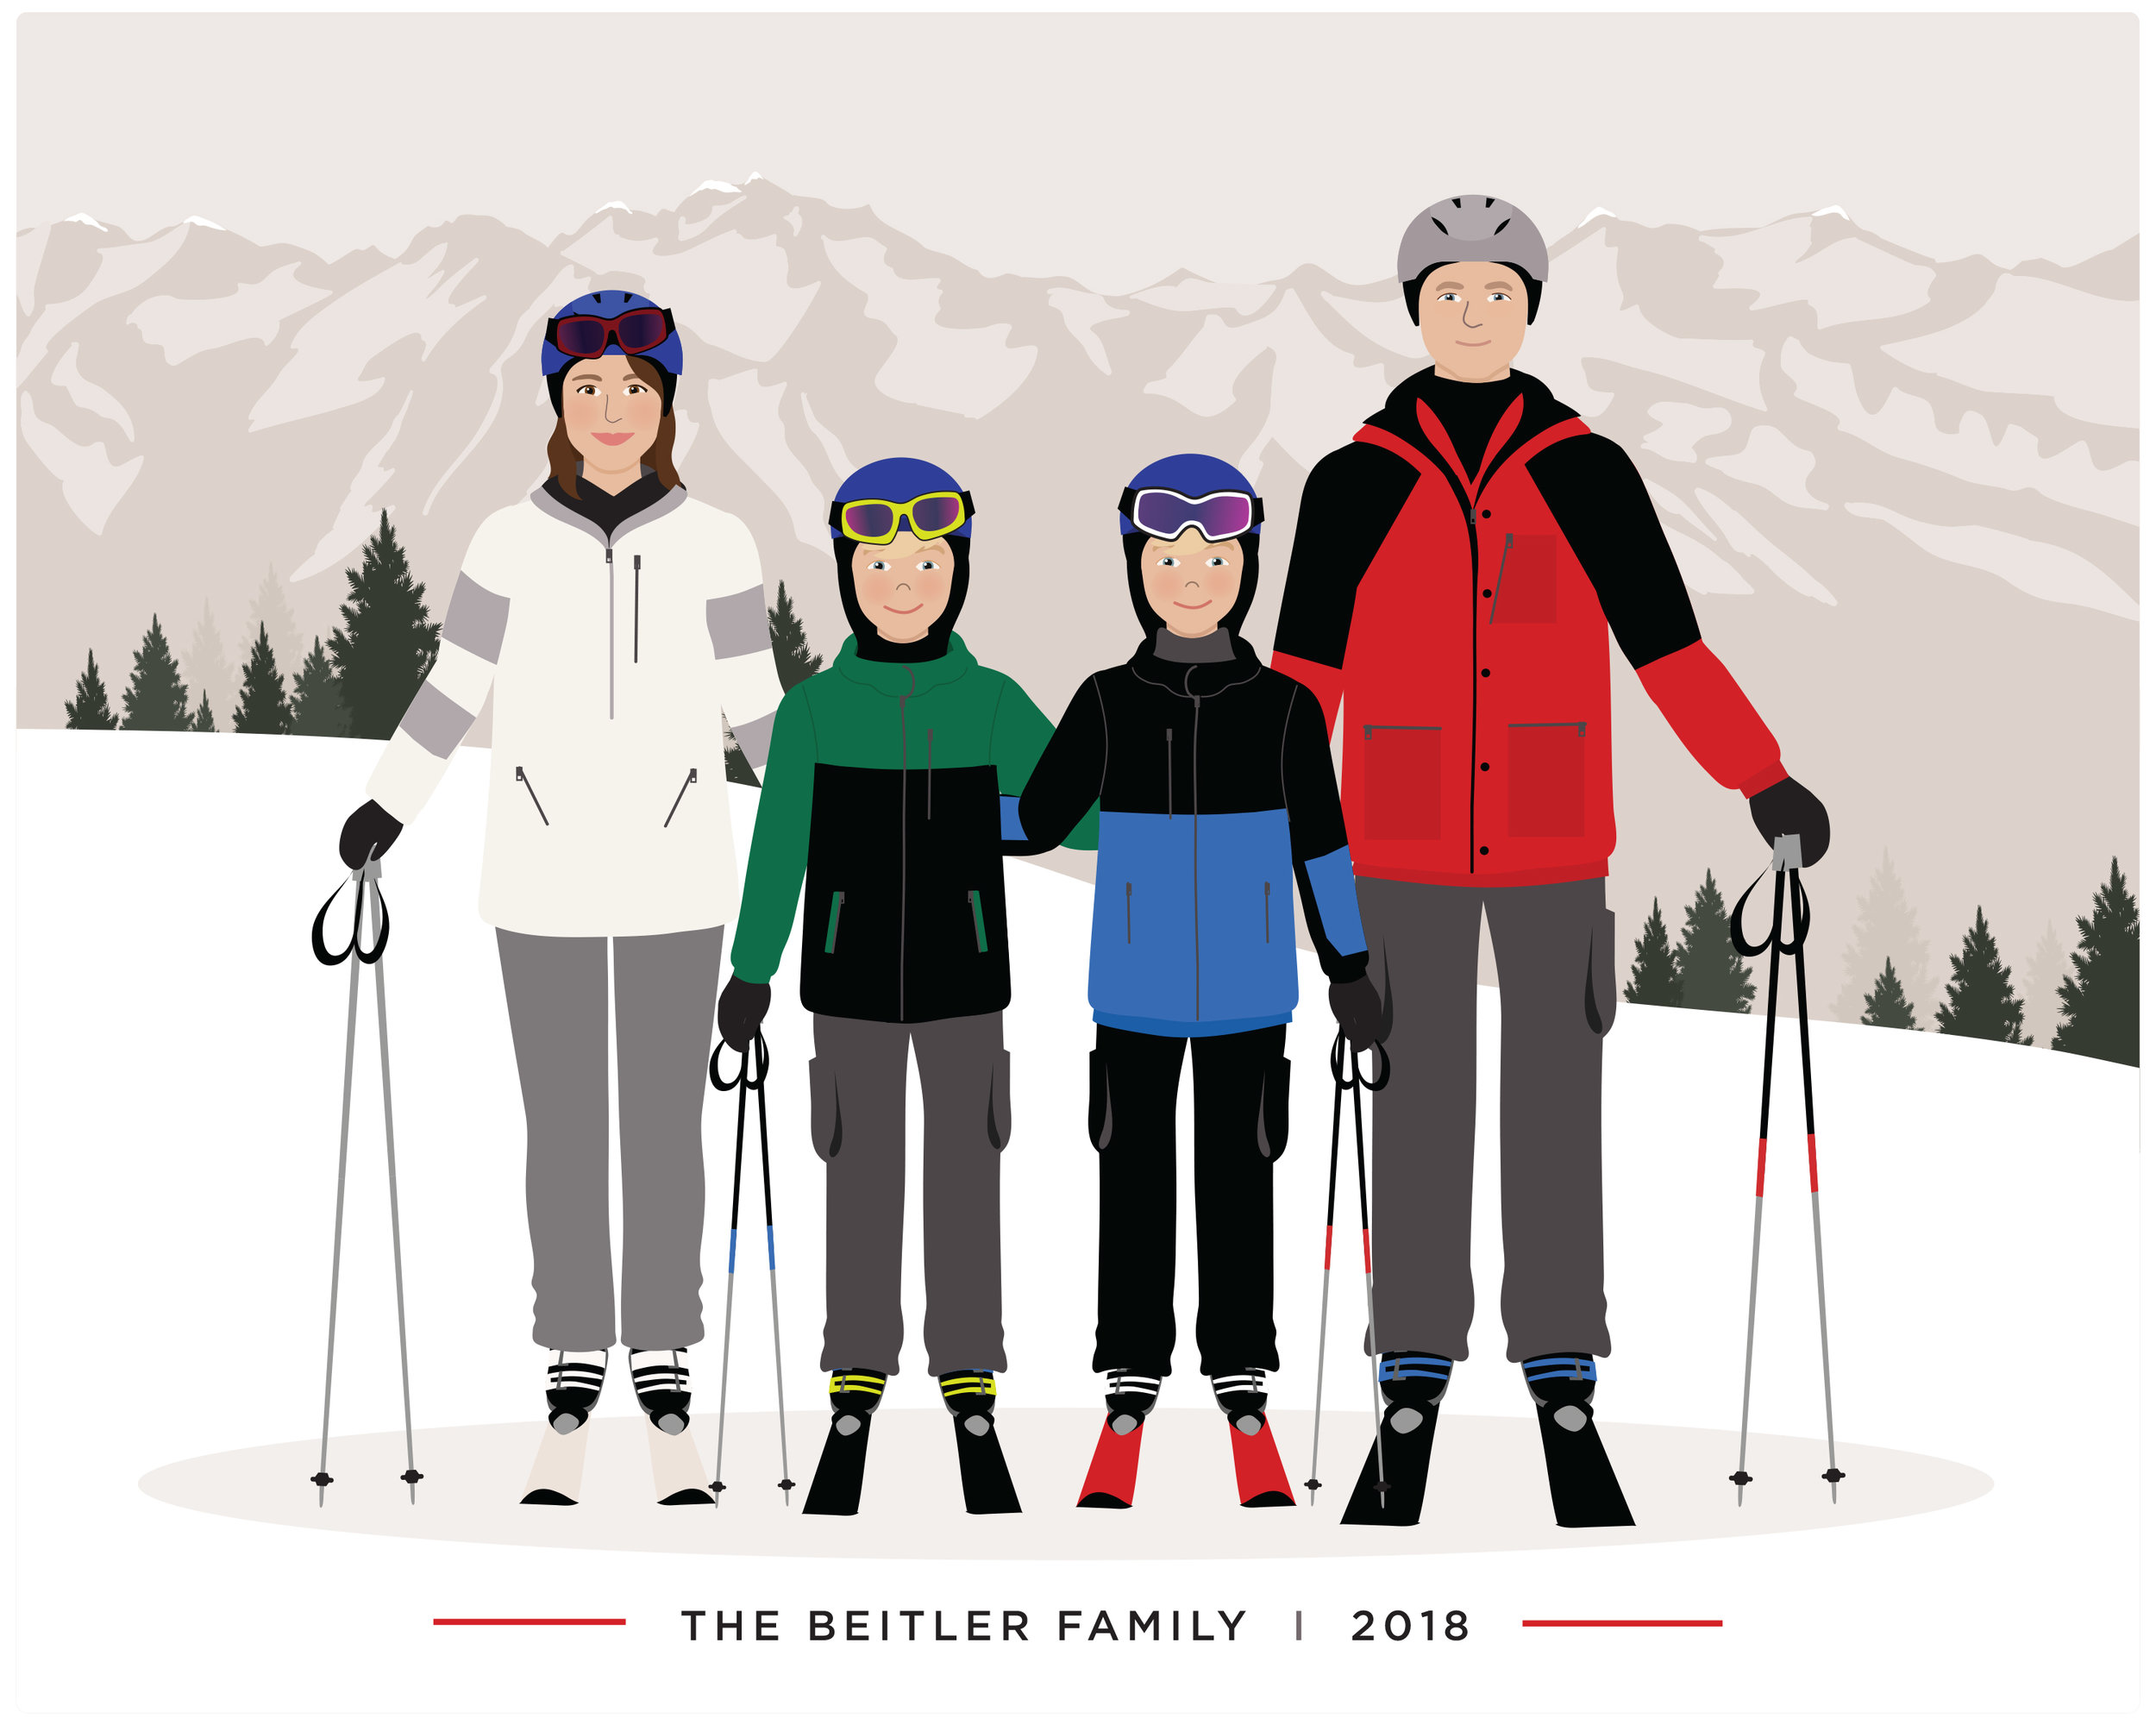 beitler ski portrait.jpg